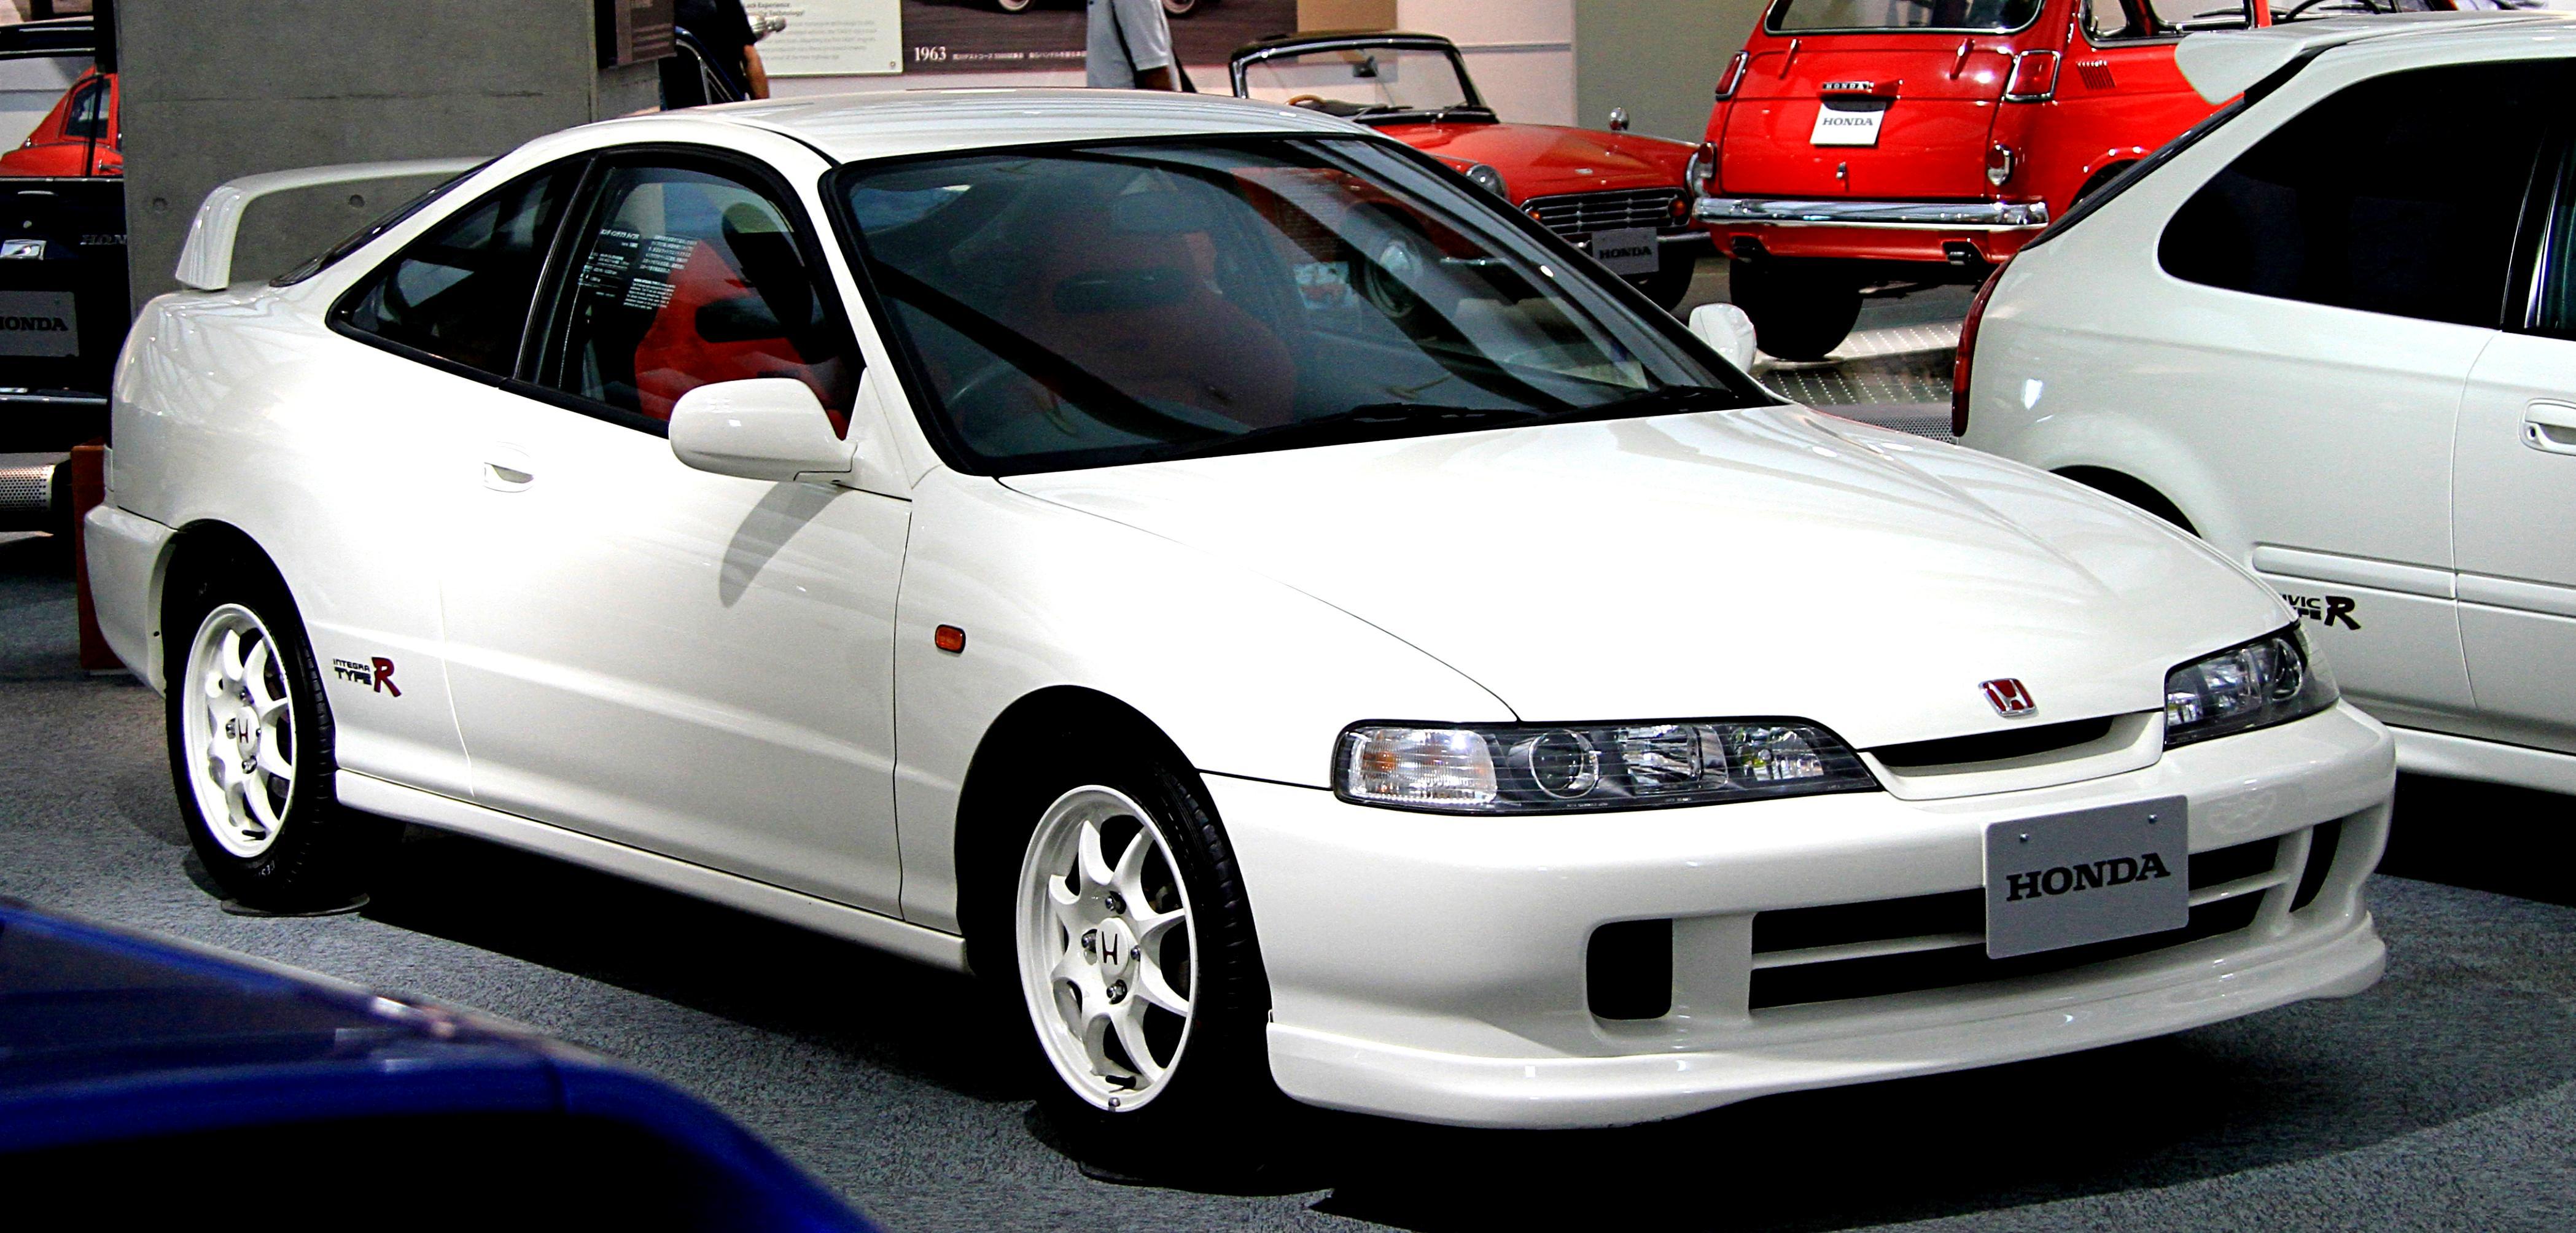 Acura TL 1995 on MotoImg.com